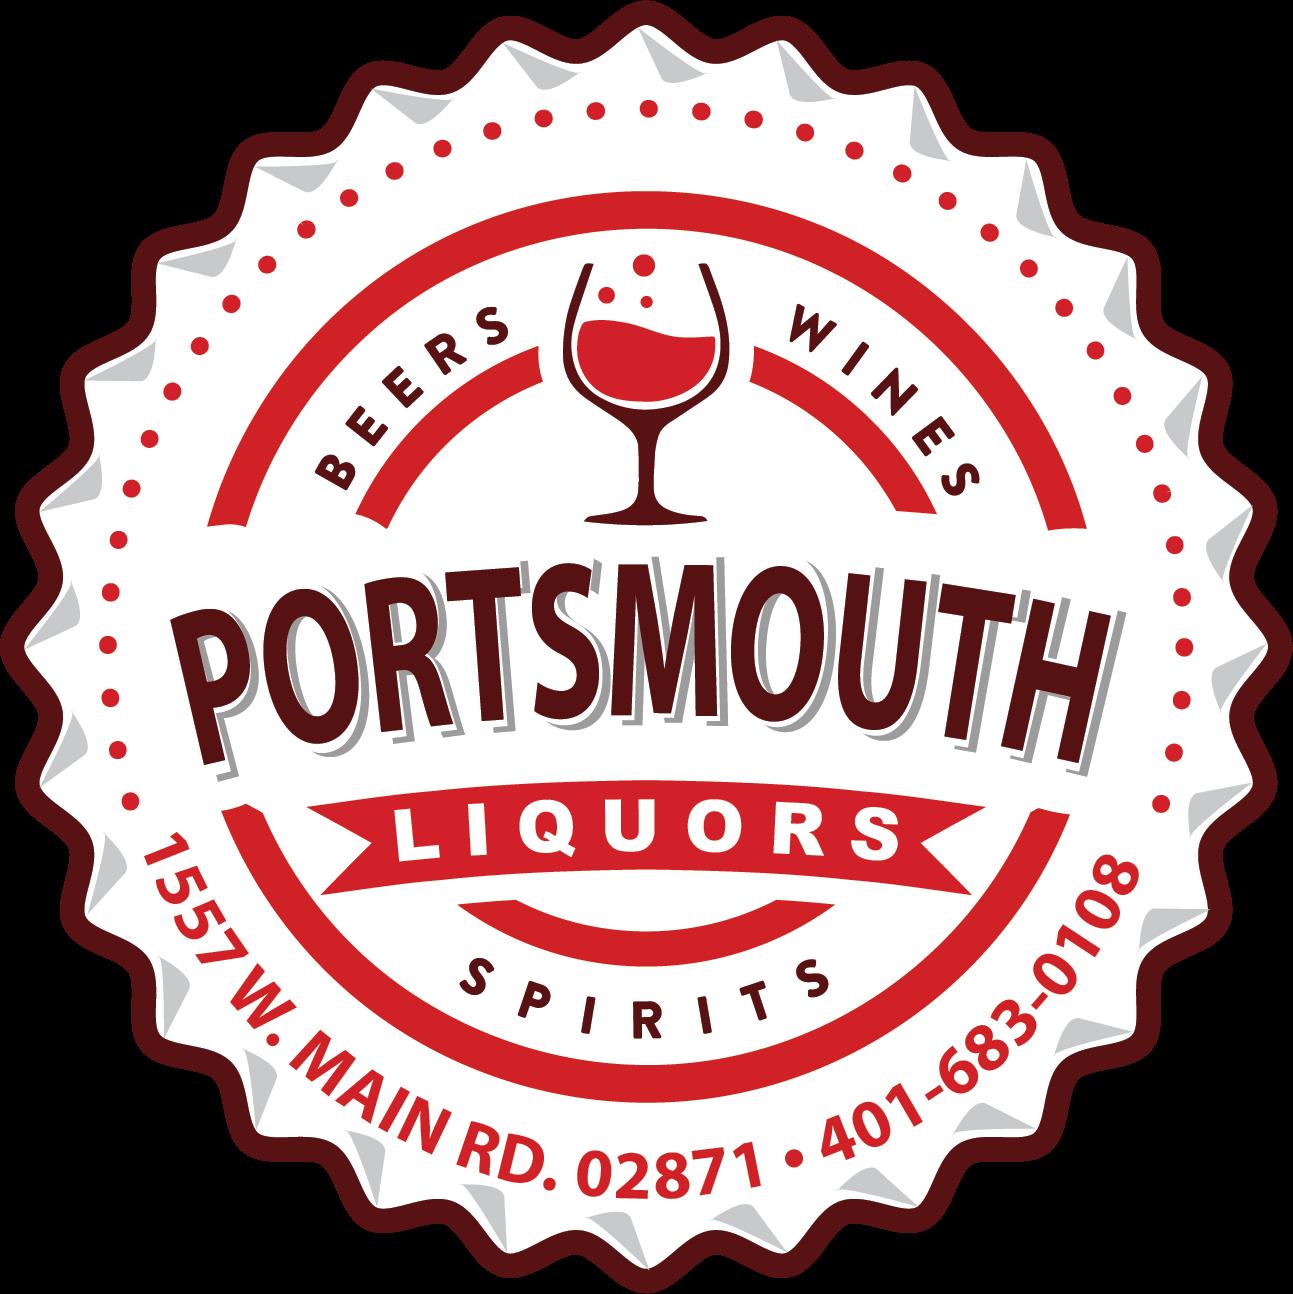 Portsmouth Liquors